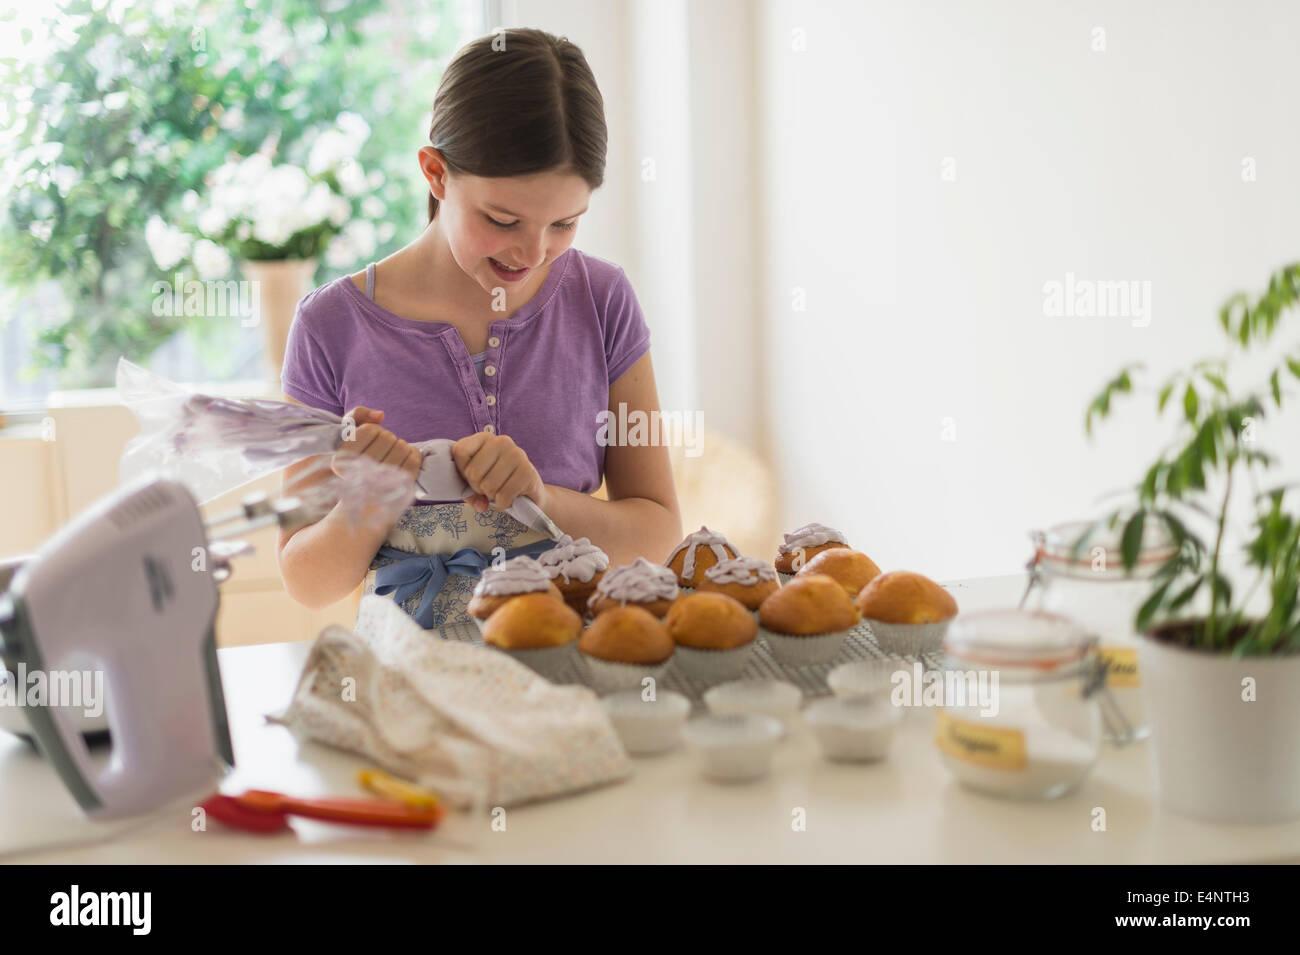 Girl (10-11) decorating cakes - Stock Image